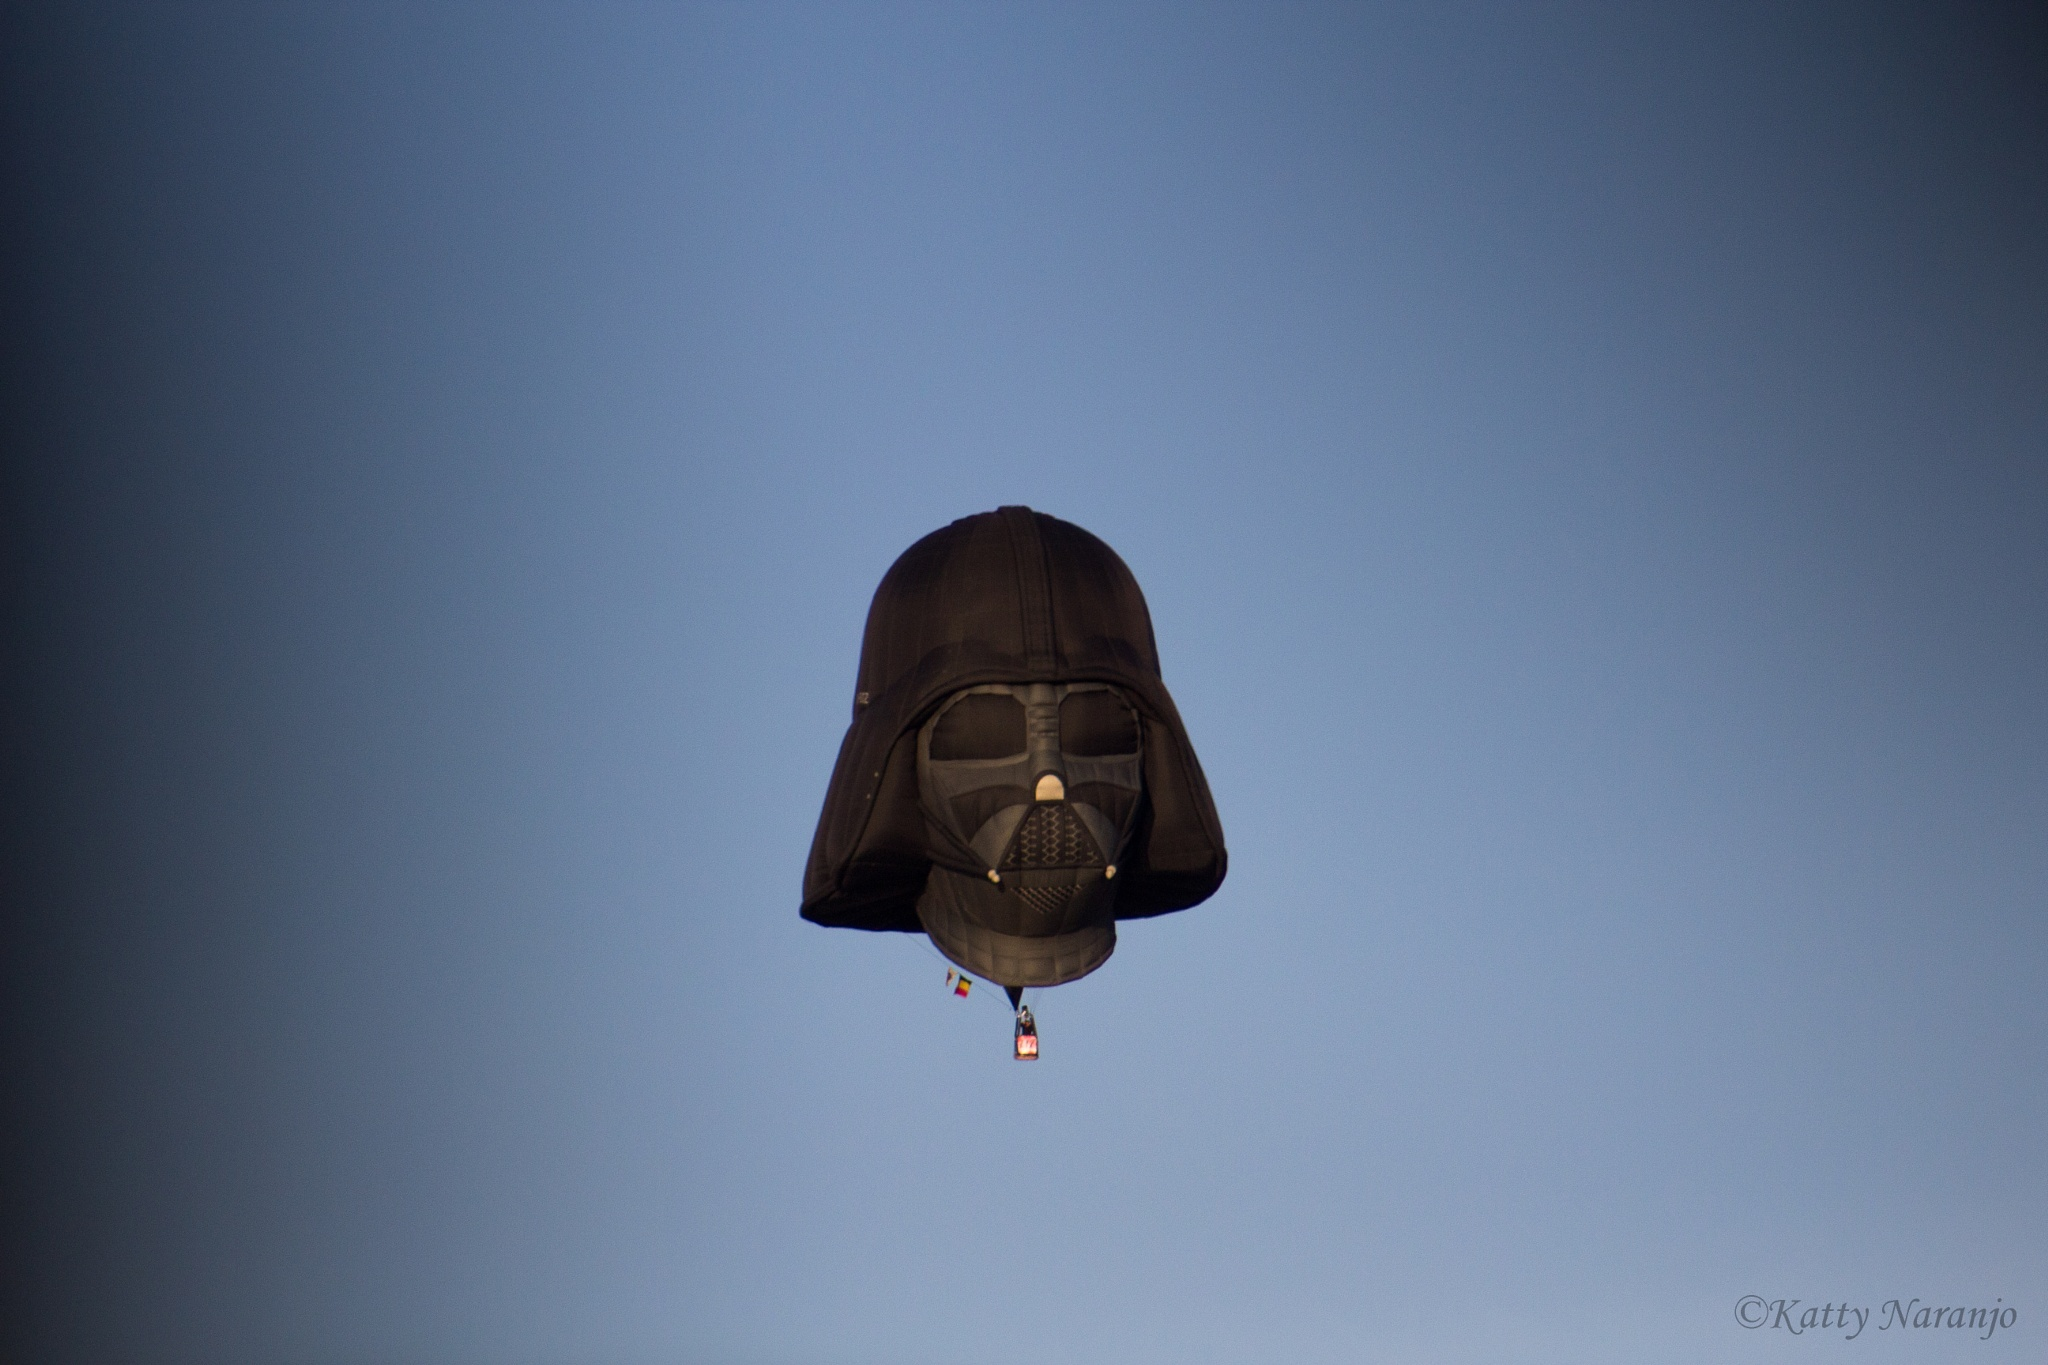 Darth Vader by Katty Naranjo